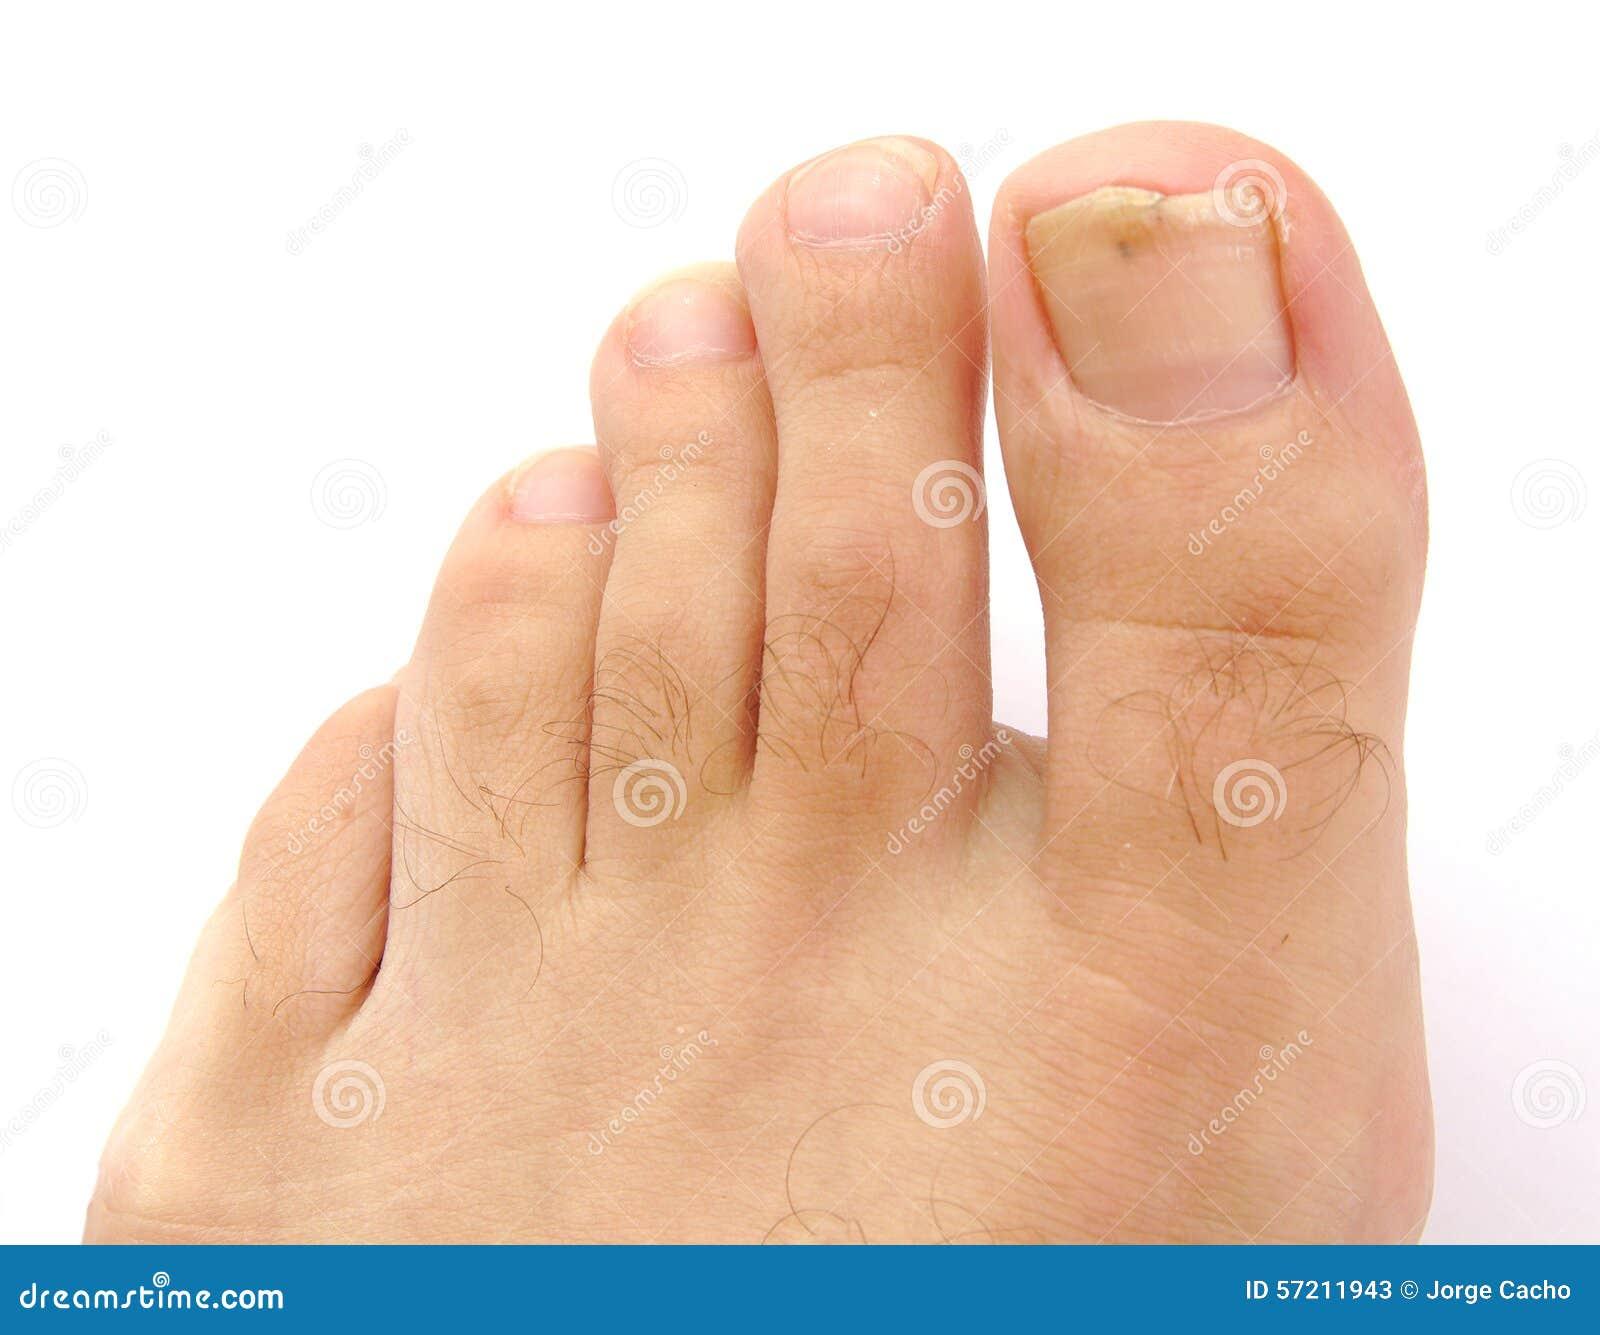 male toes pics